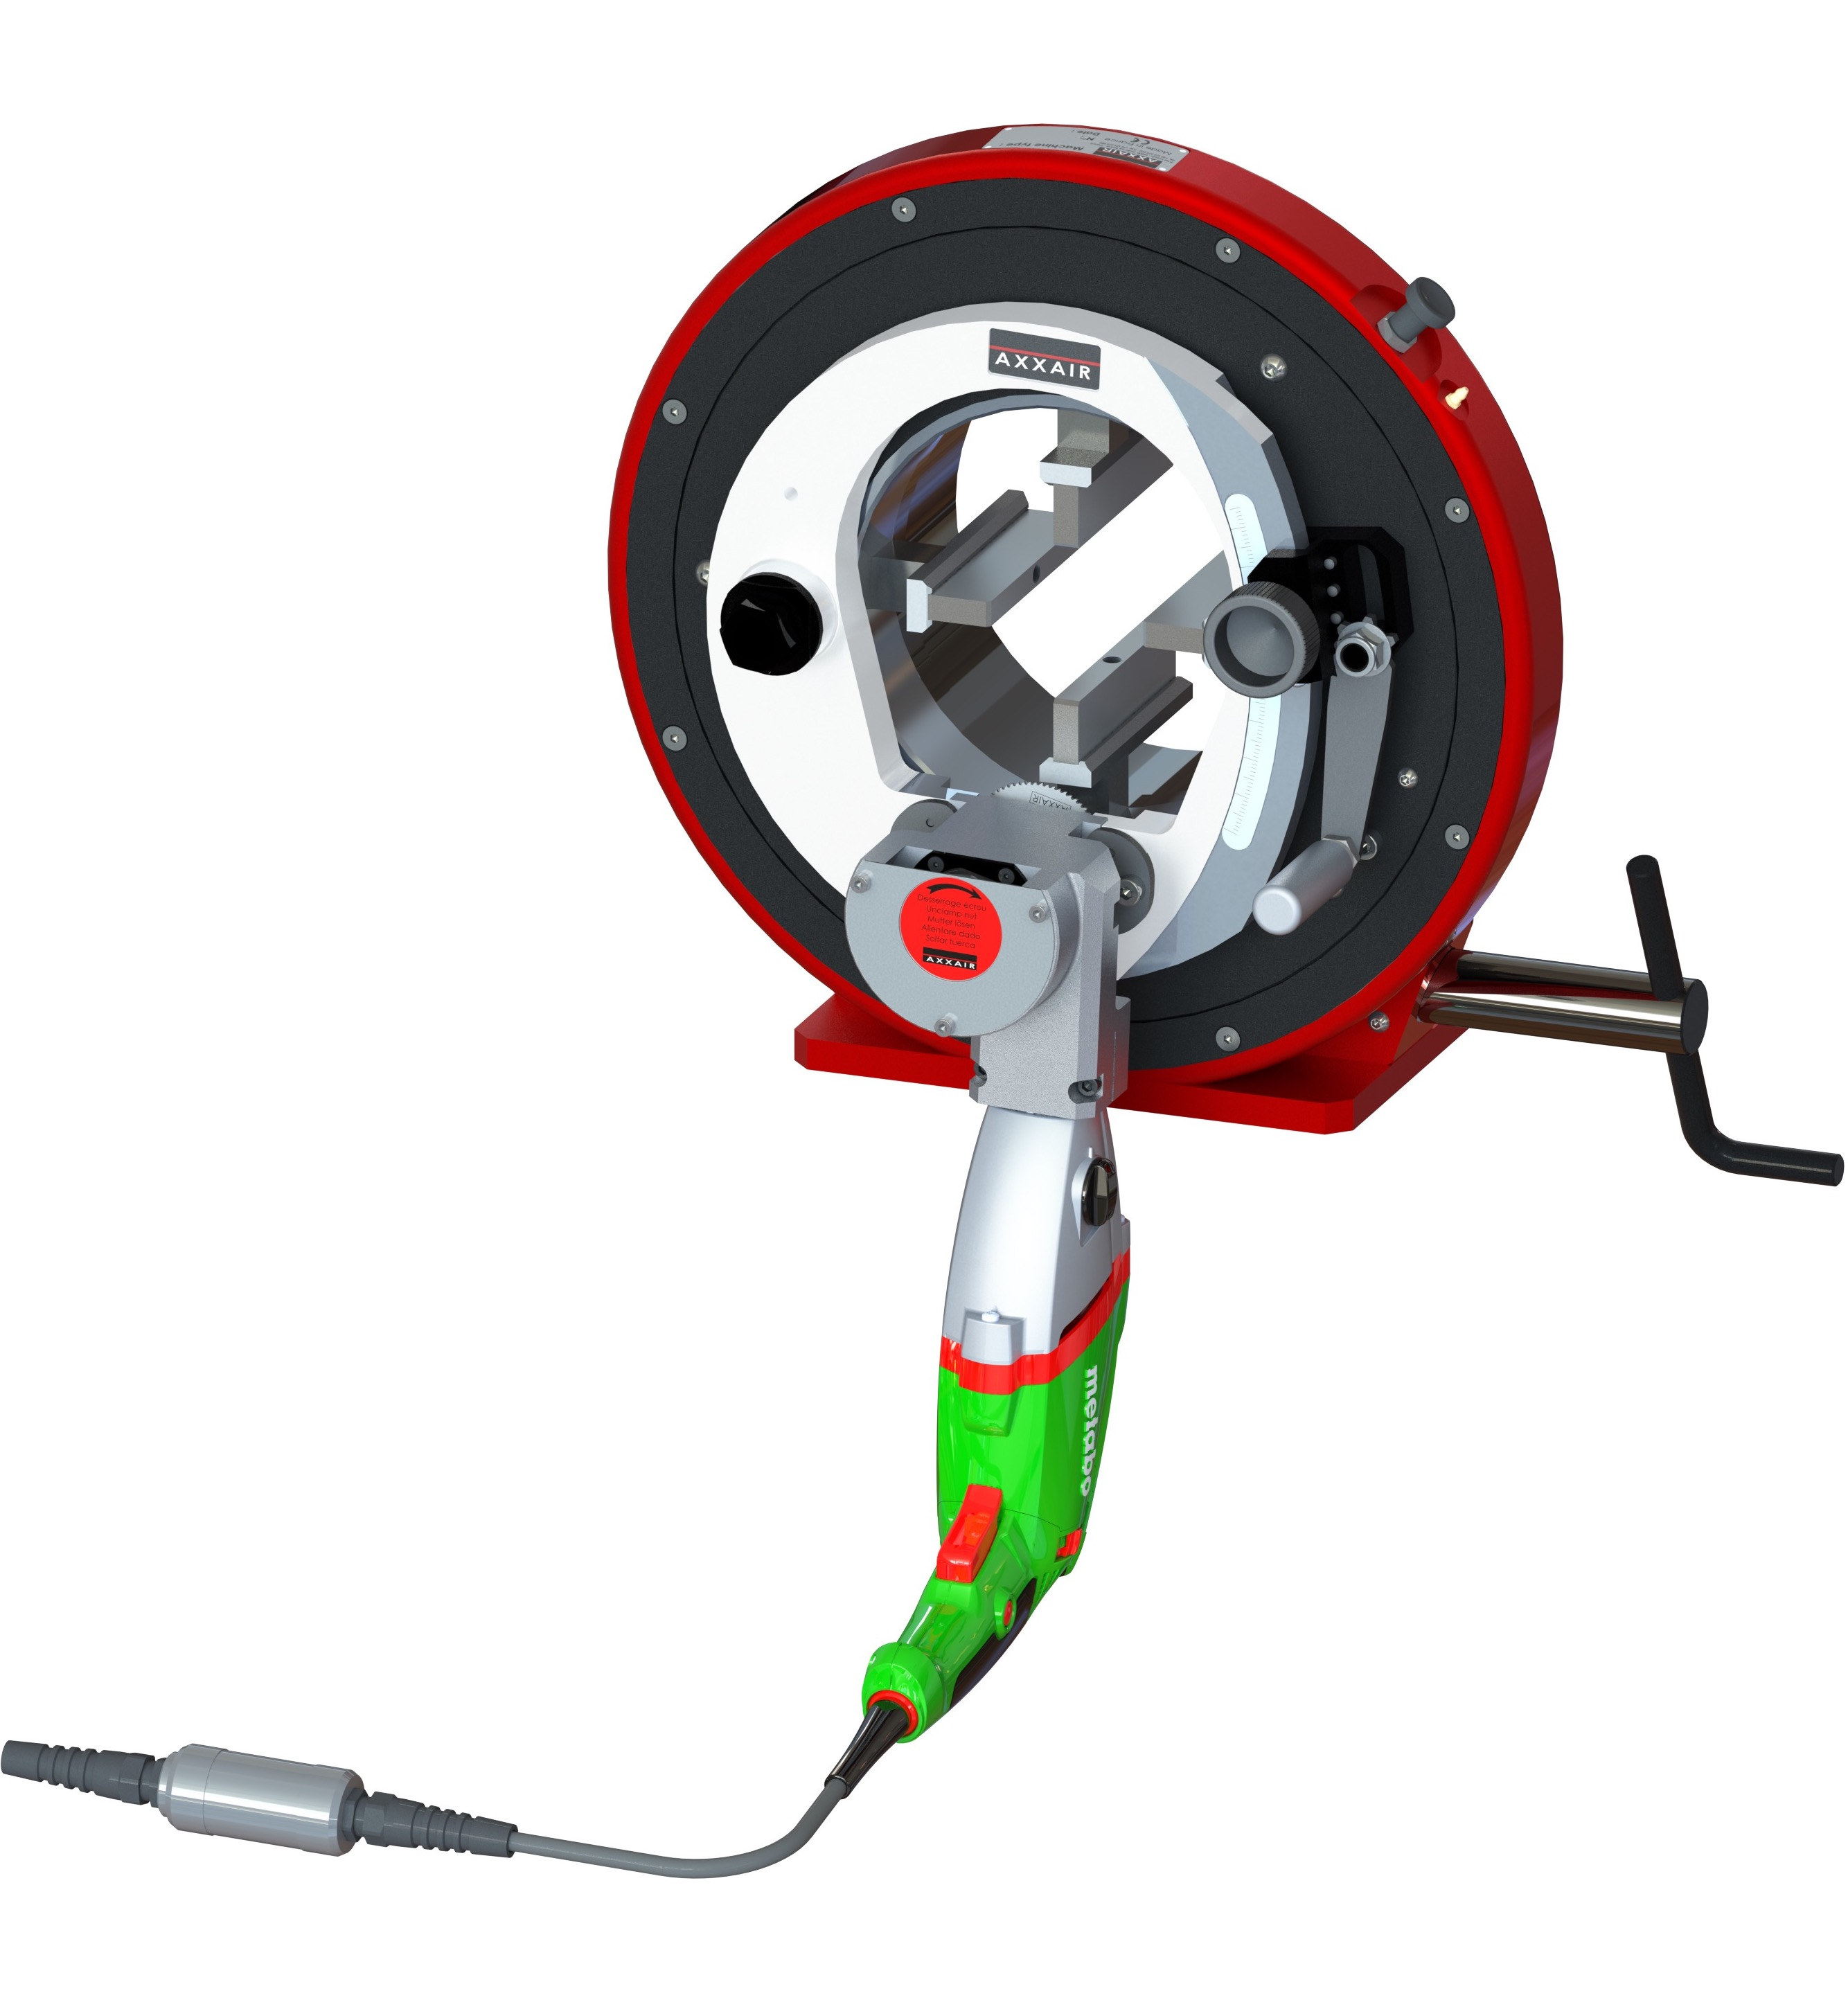 New Orbital Cutting Machine AXXAIR 171ECO